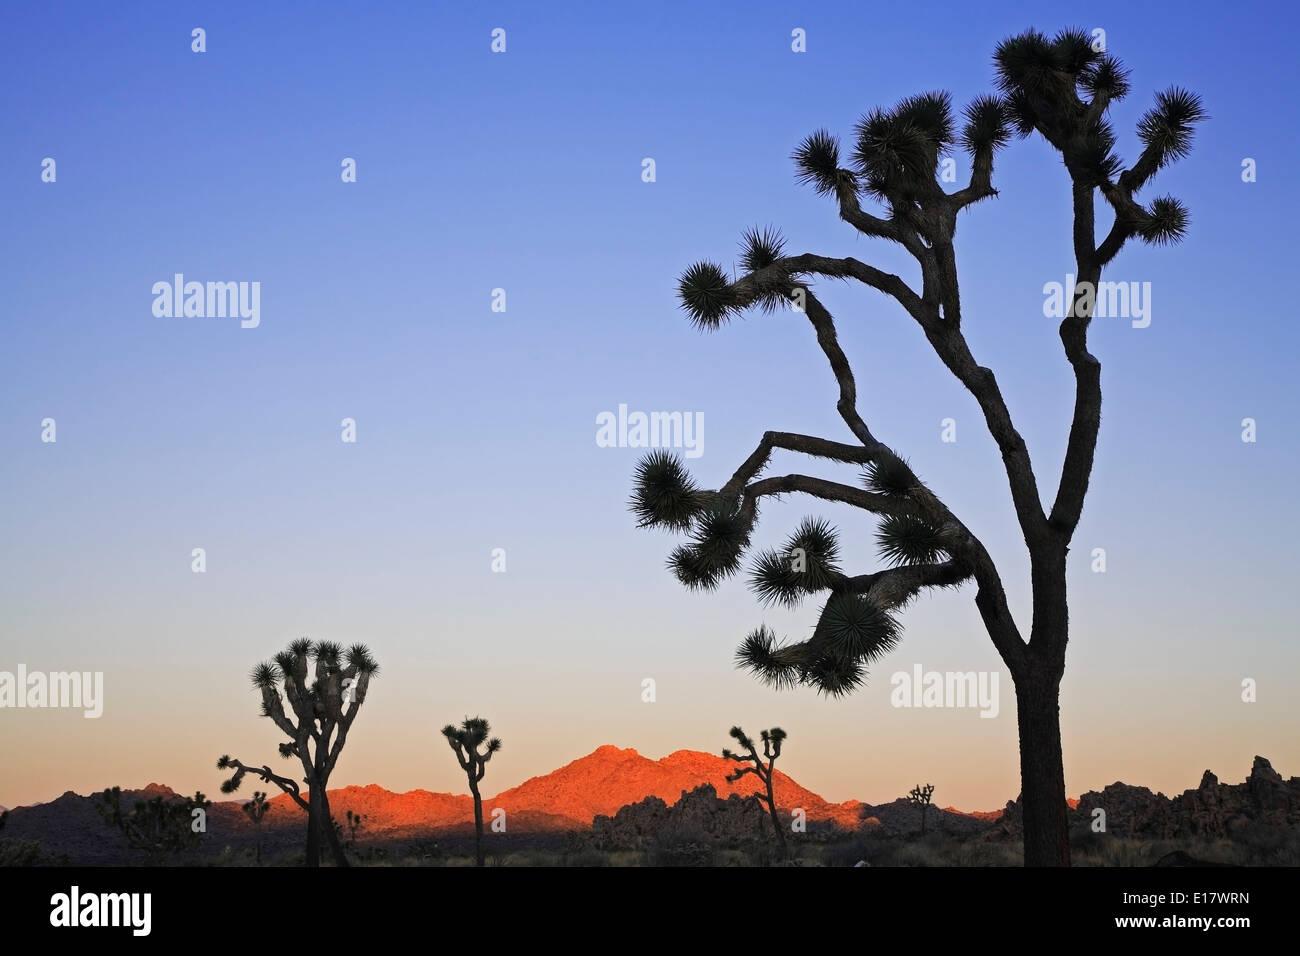 Joshua trees (Yucca brevifolia) silhouettes et les collines, le parc national Joshua Tree, California USA USA Photo Stock